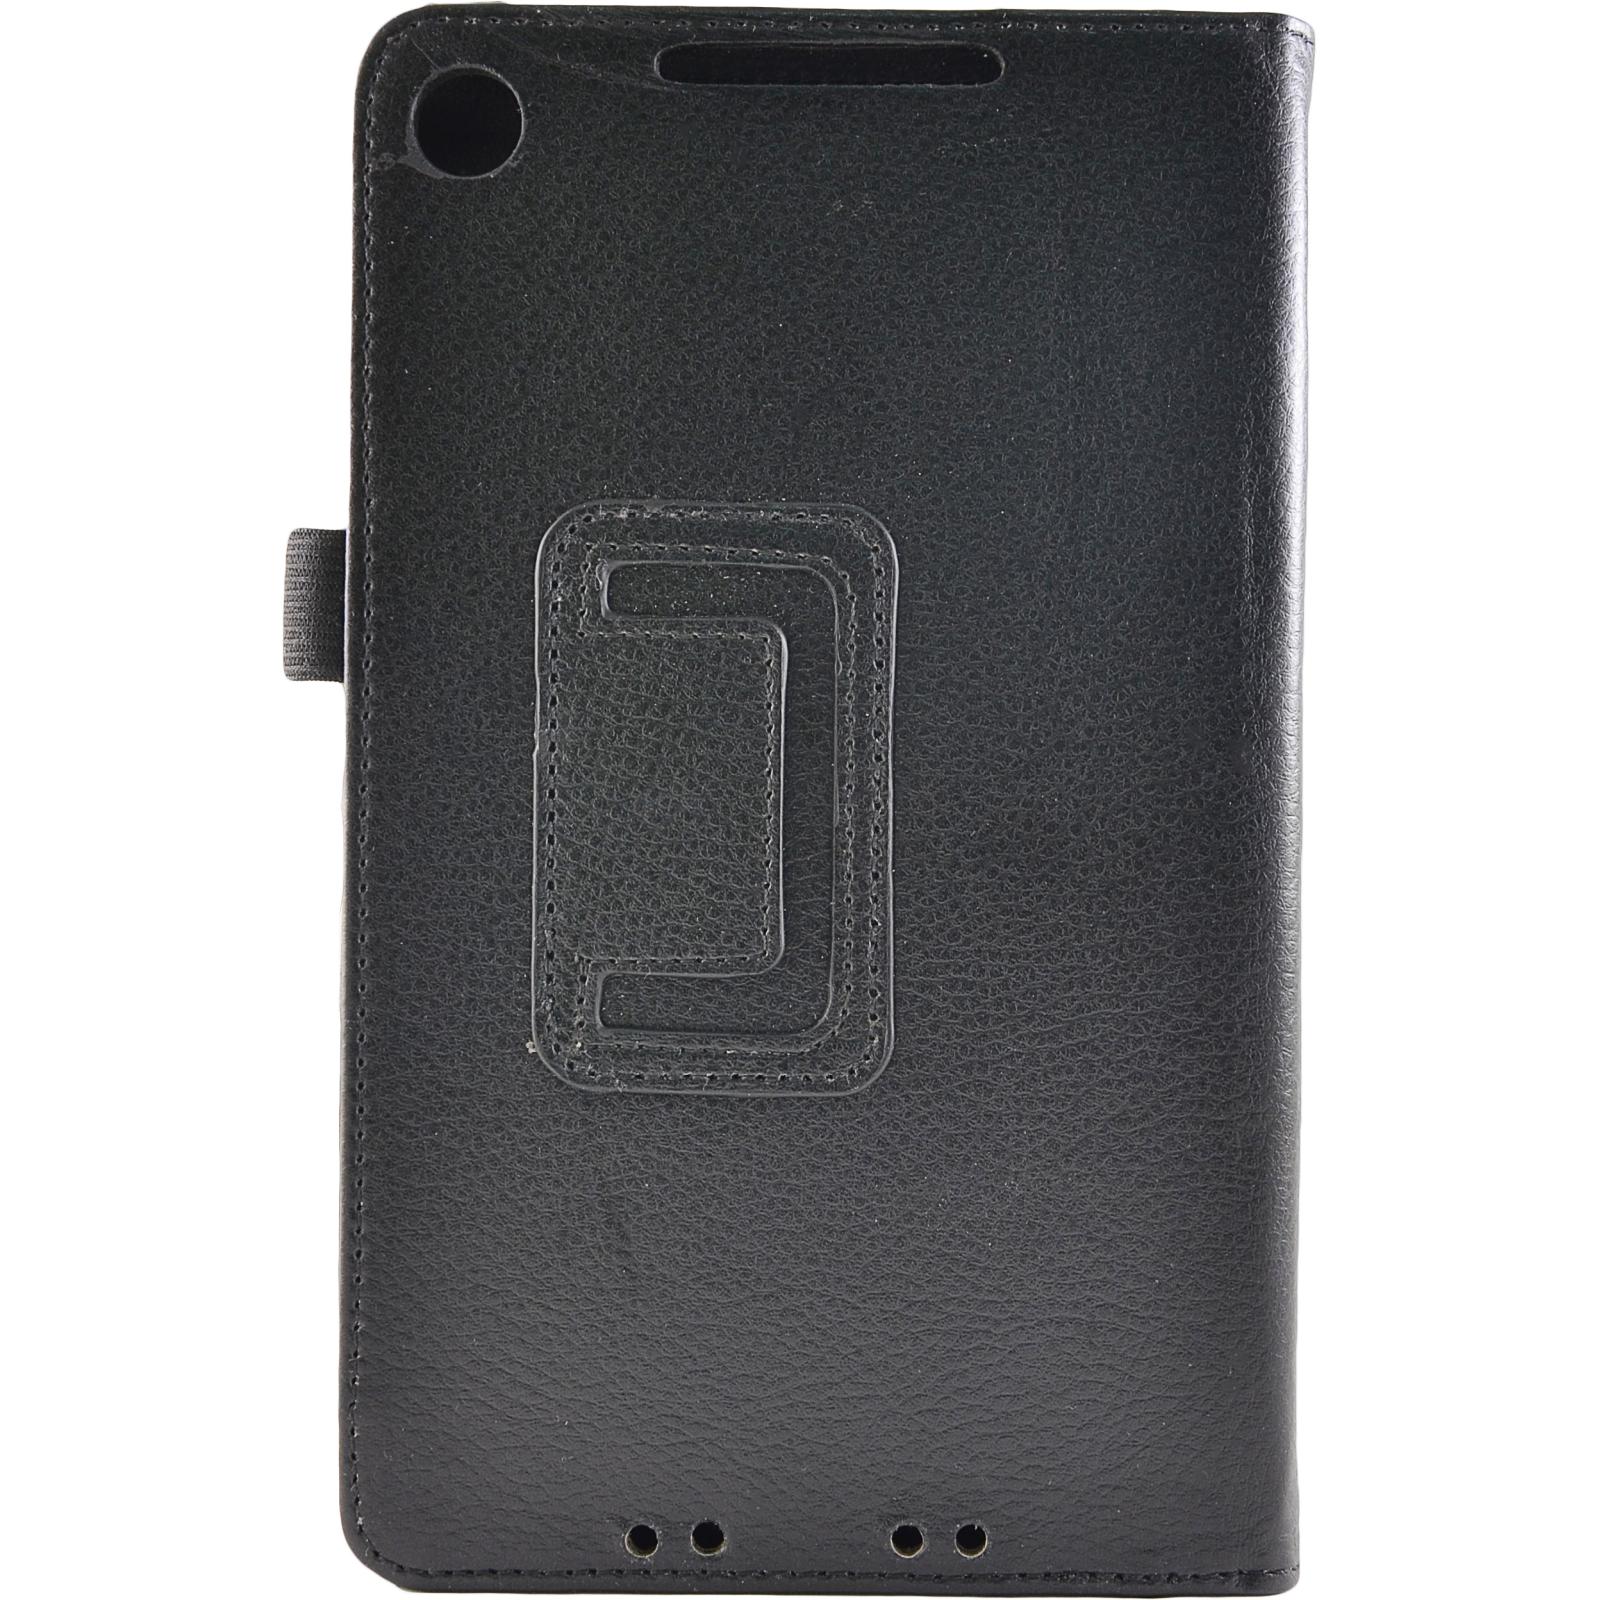 Чехол для планшета Pro-case Google Asus Nexus 7 new (Nexus 7new) изображение 2